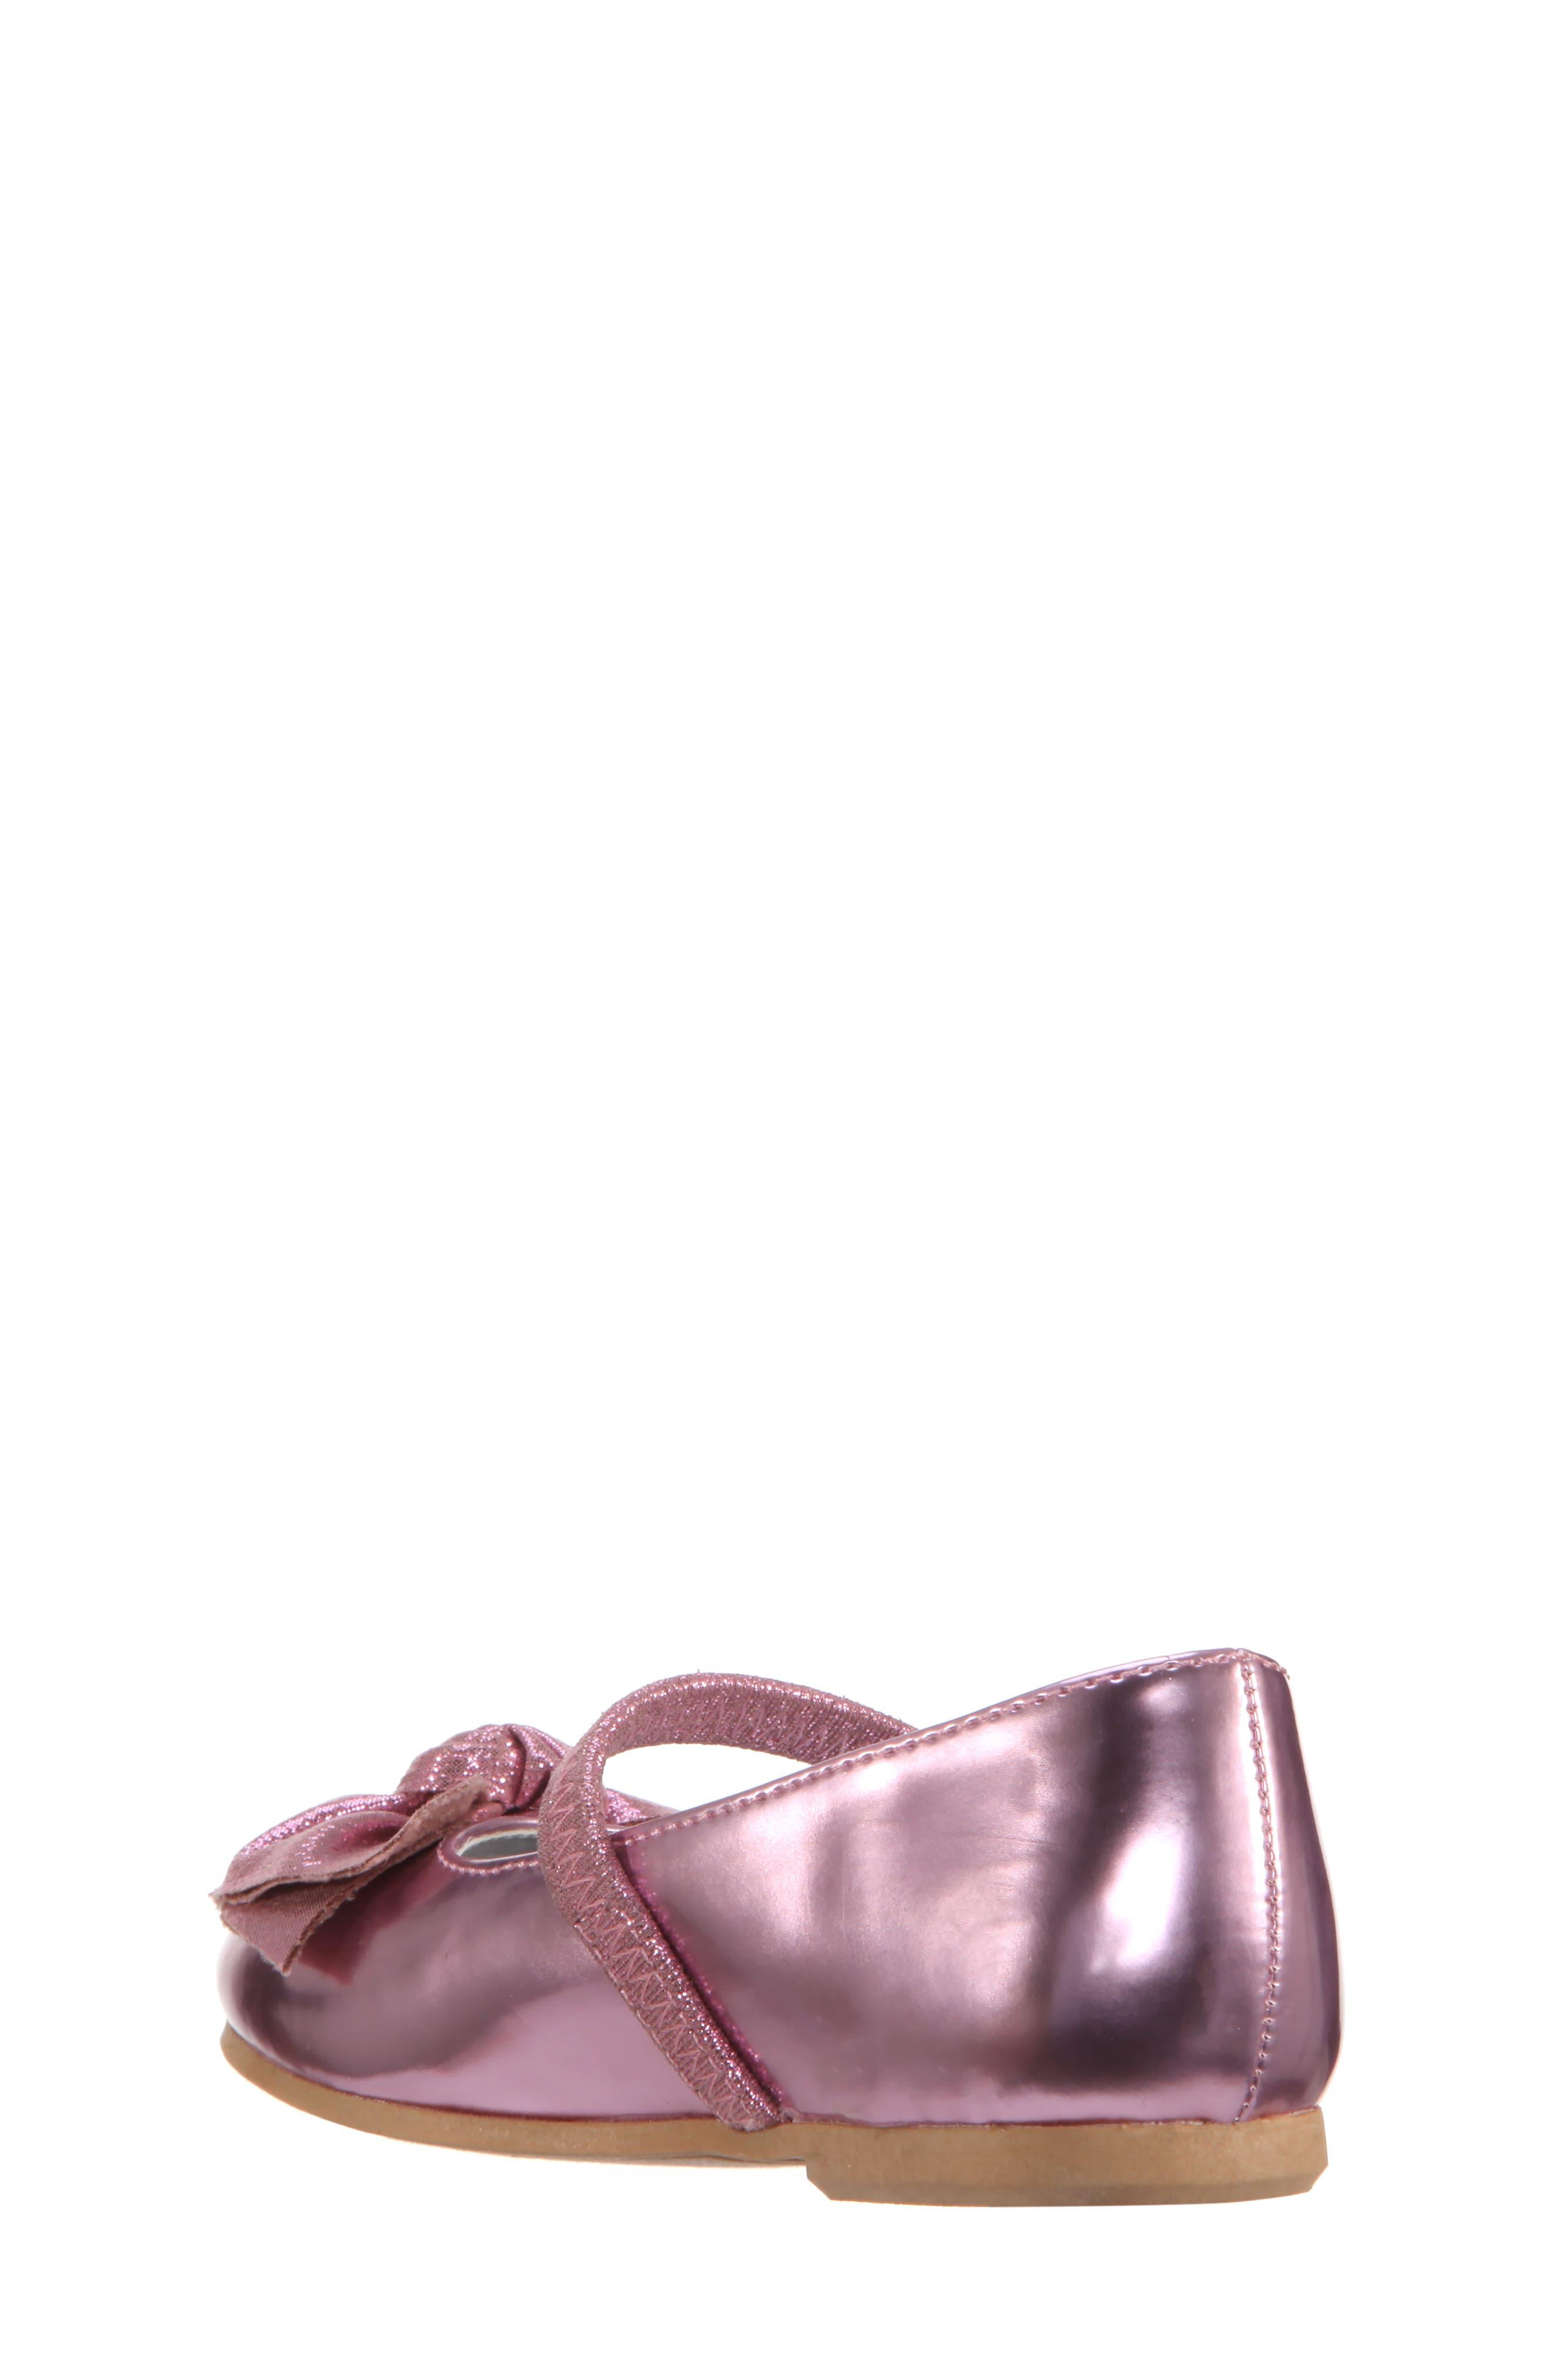 Kaytelyn-T Glitter Bow Ballet Flat,                             Alternate thumbnail 12, color,